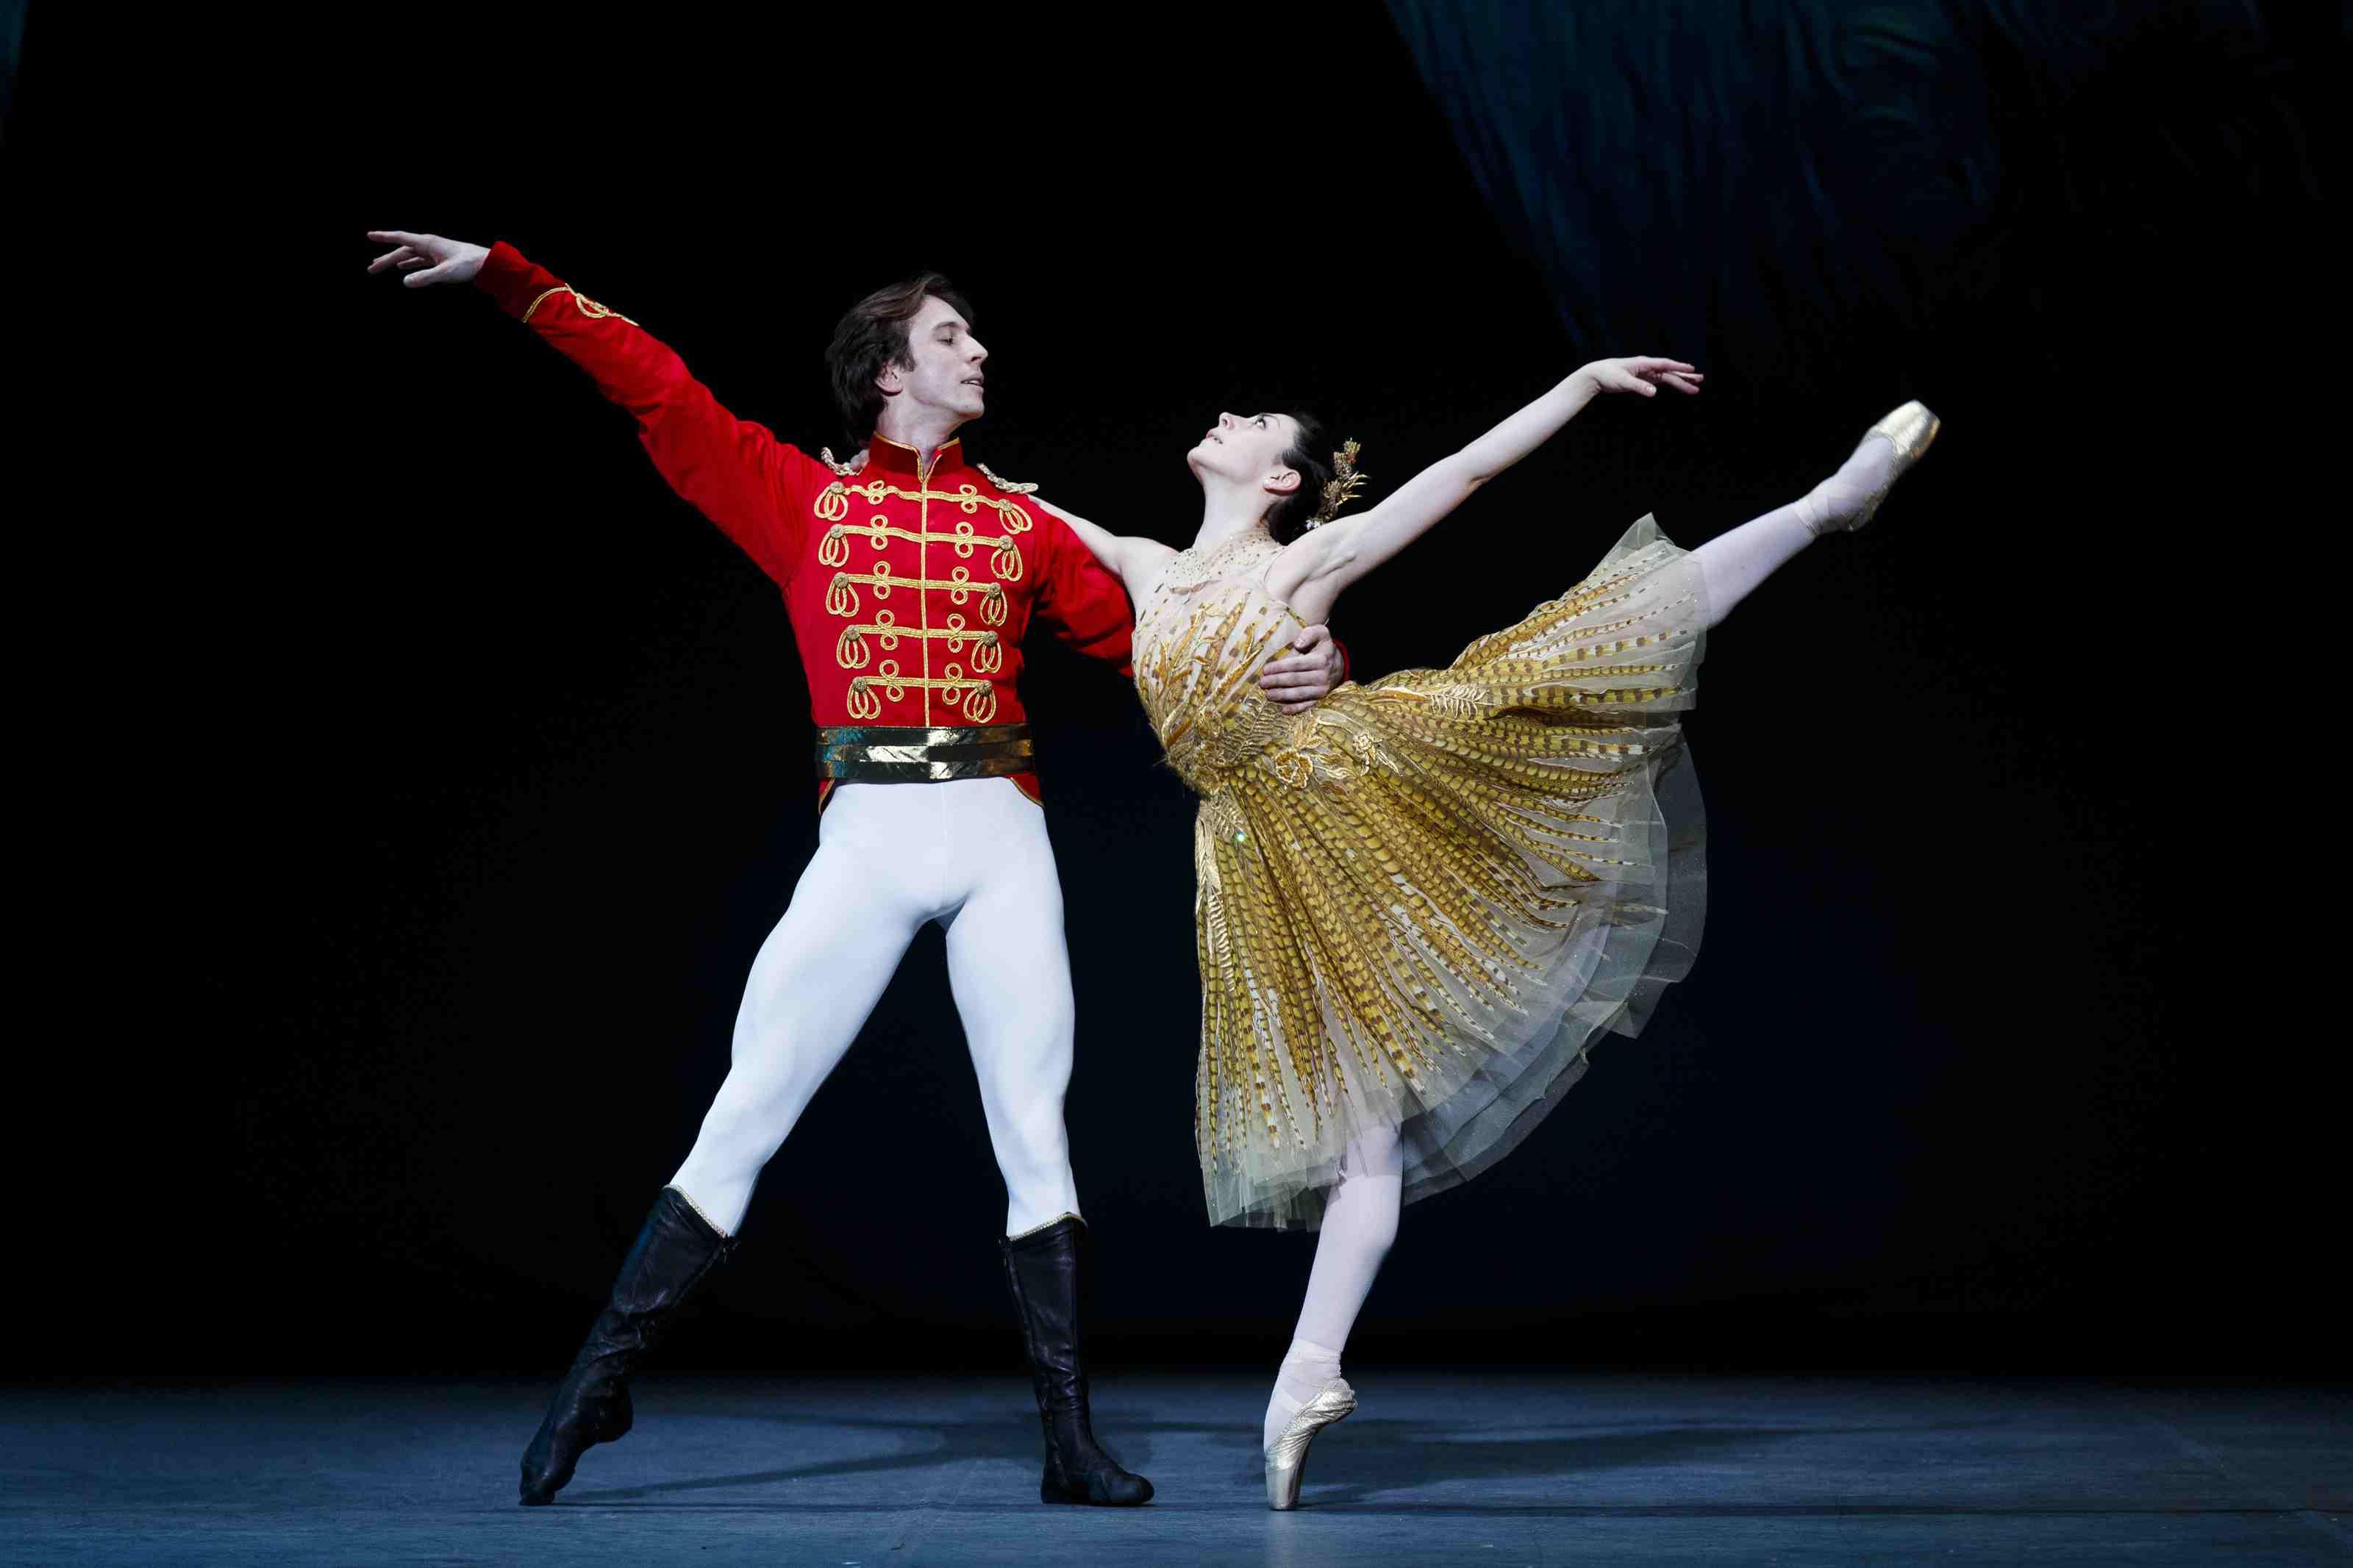 Maia Makhateli and Artur Shesterikov perform Cinderella